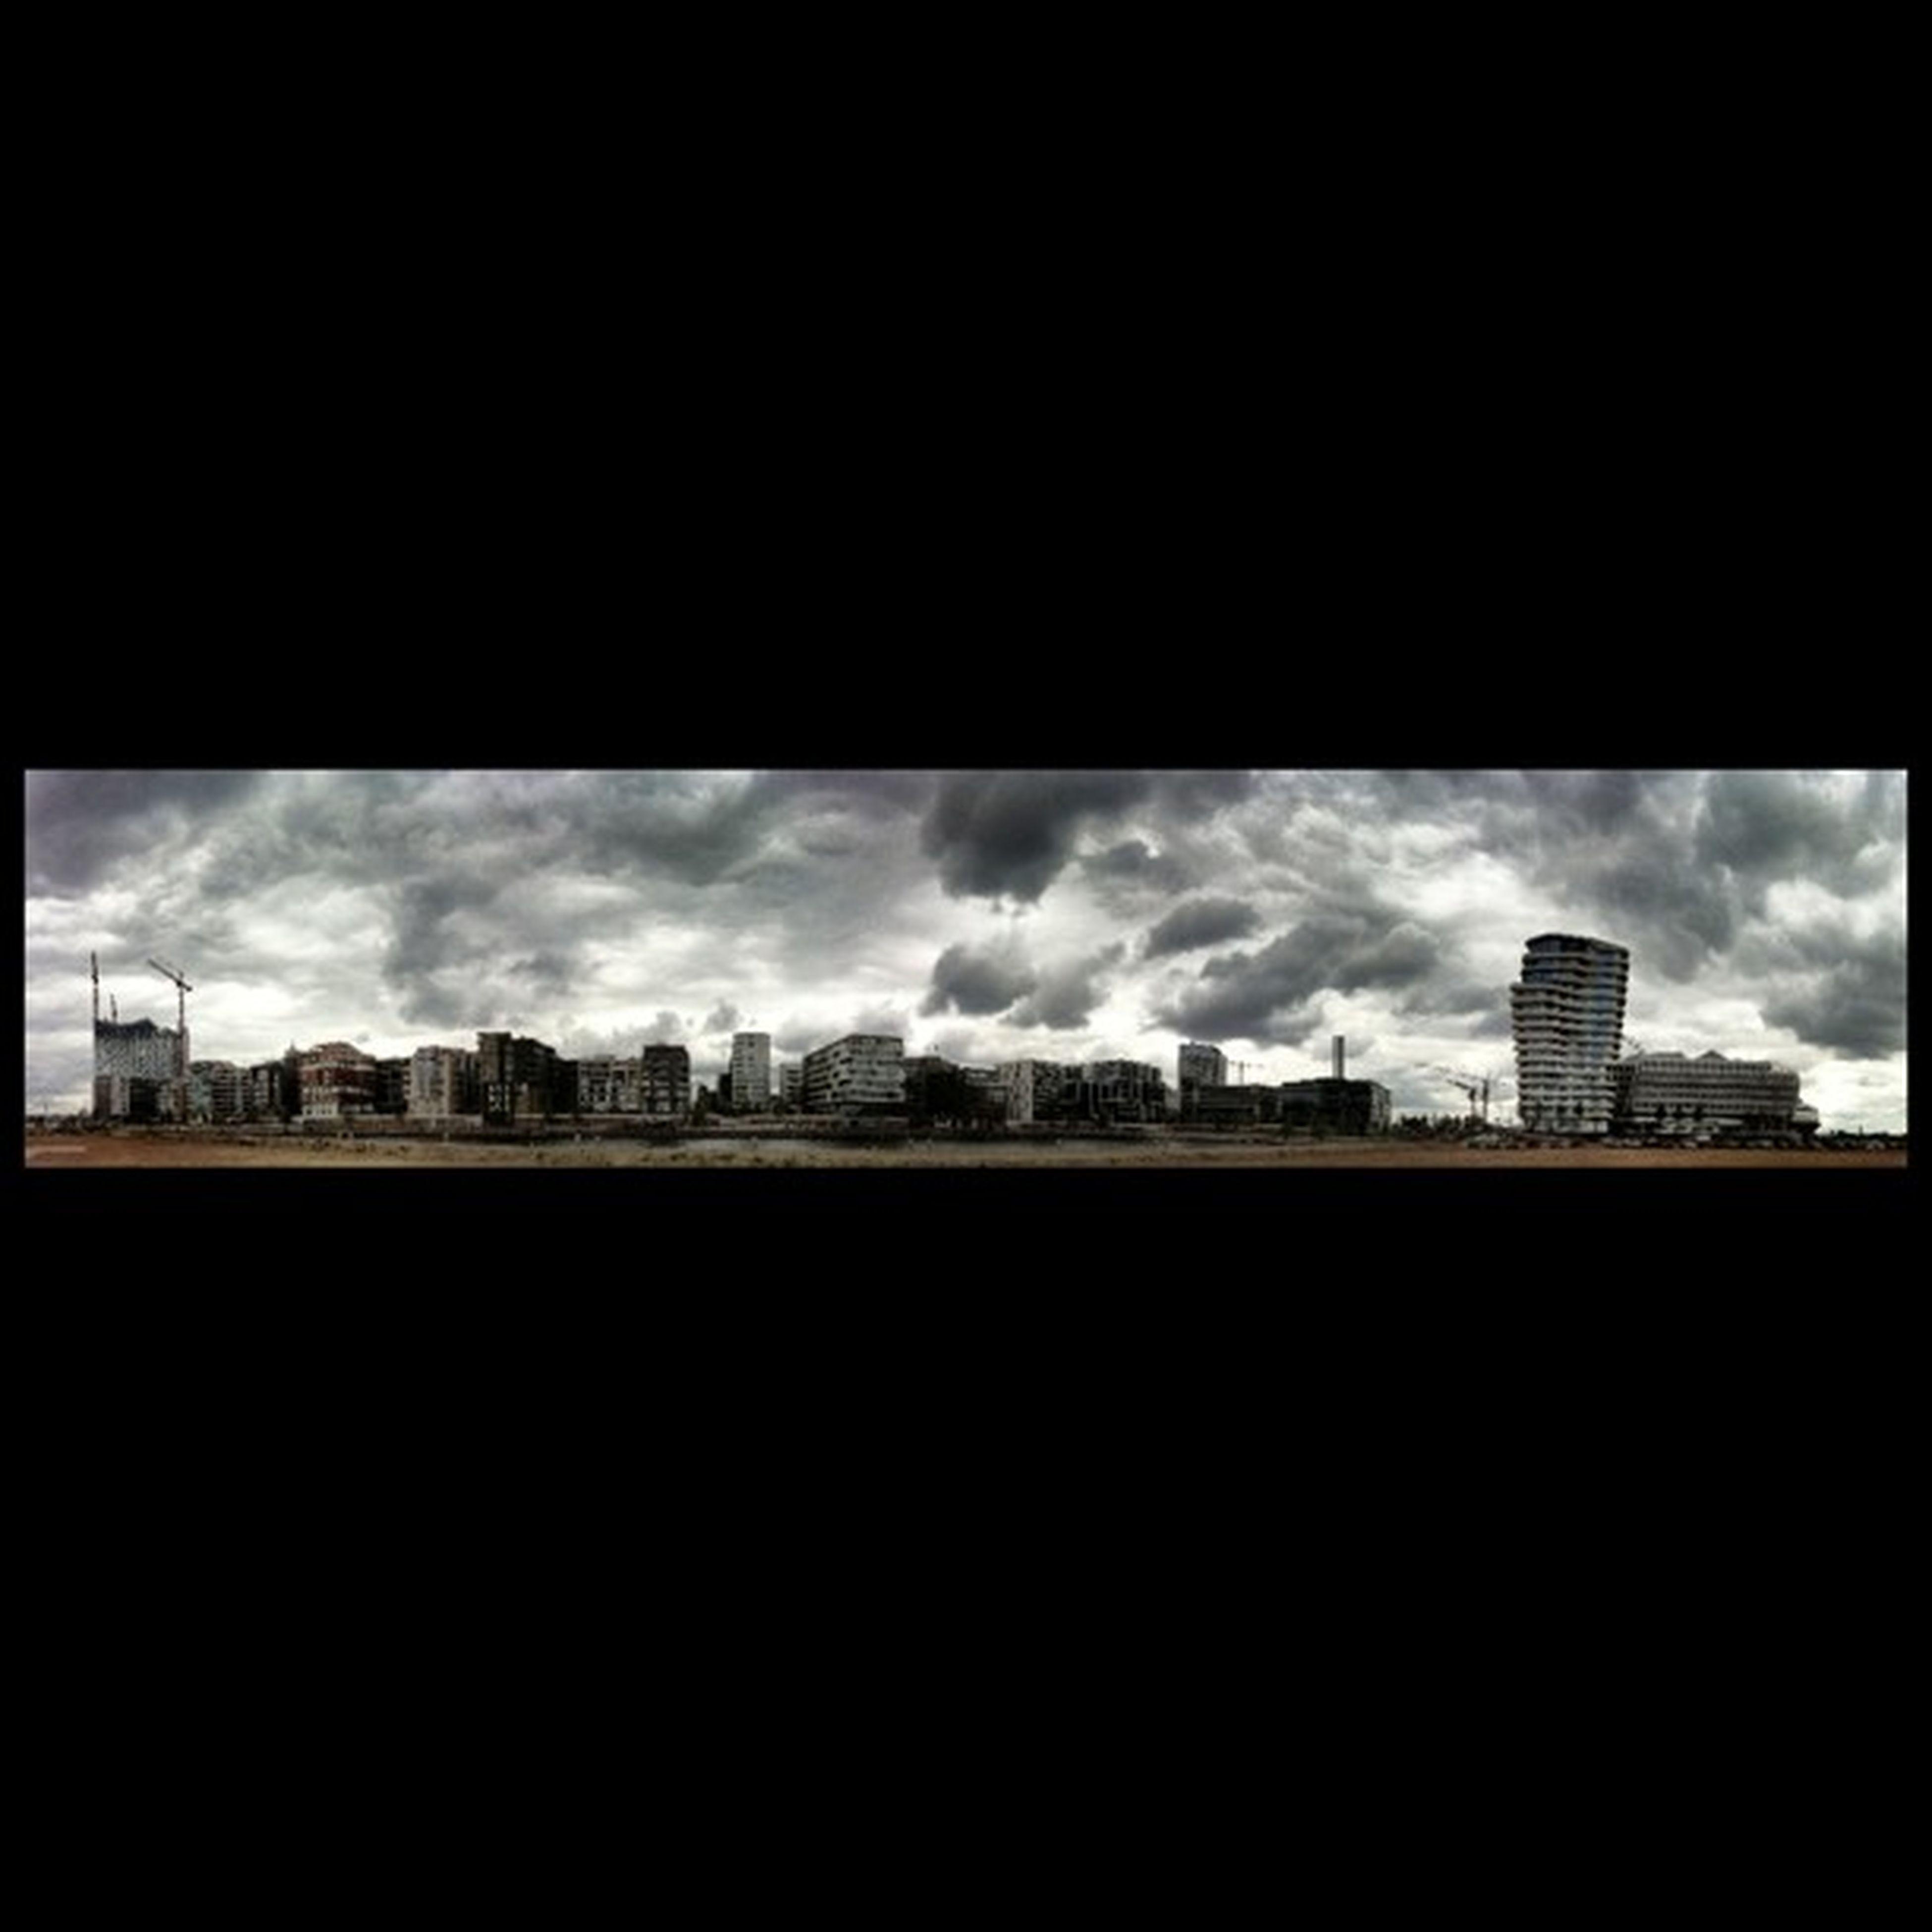 architecture, built structure, building exterior, silhouette, sky, city, copy space, dark, cityscape, residential structure, cloud - sky, building, window, residential building, cloud, no people, outdoors, dusk, house